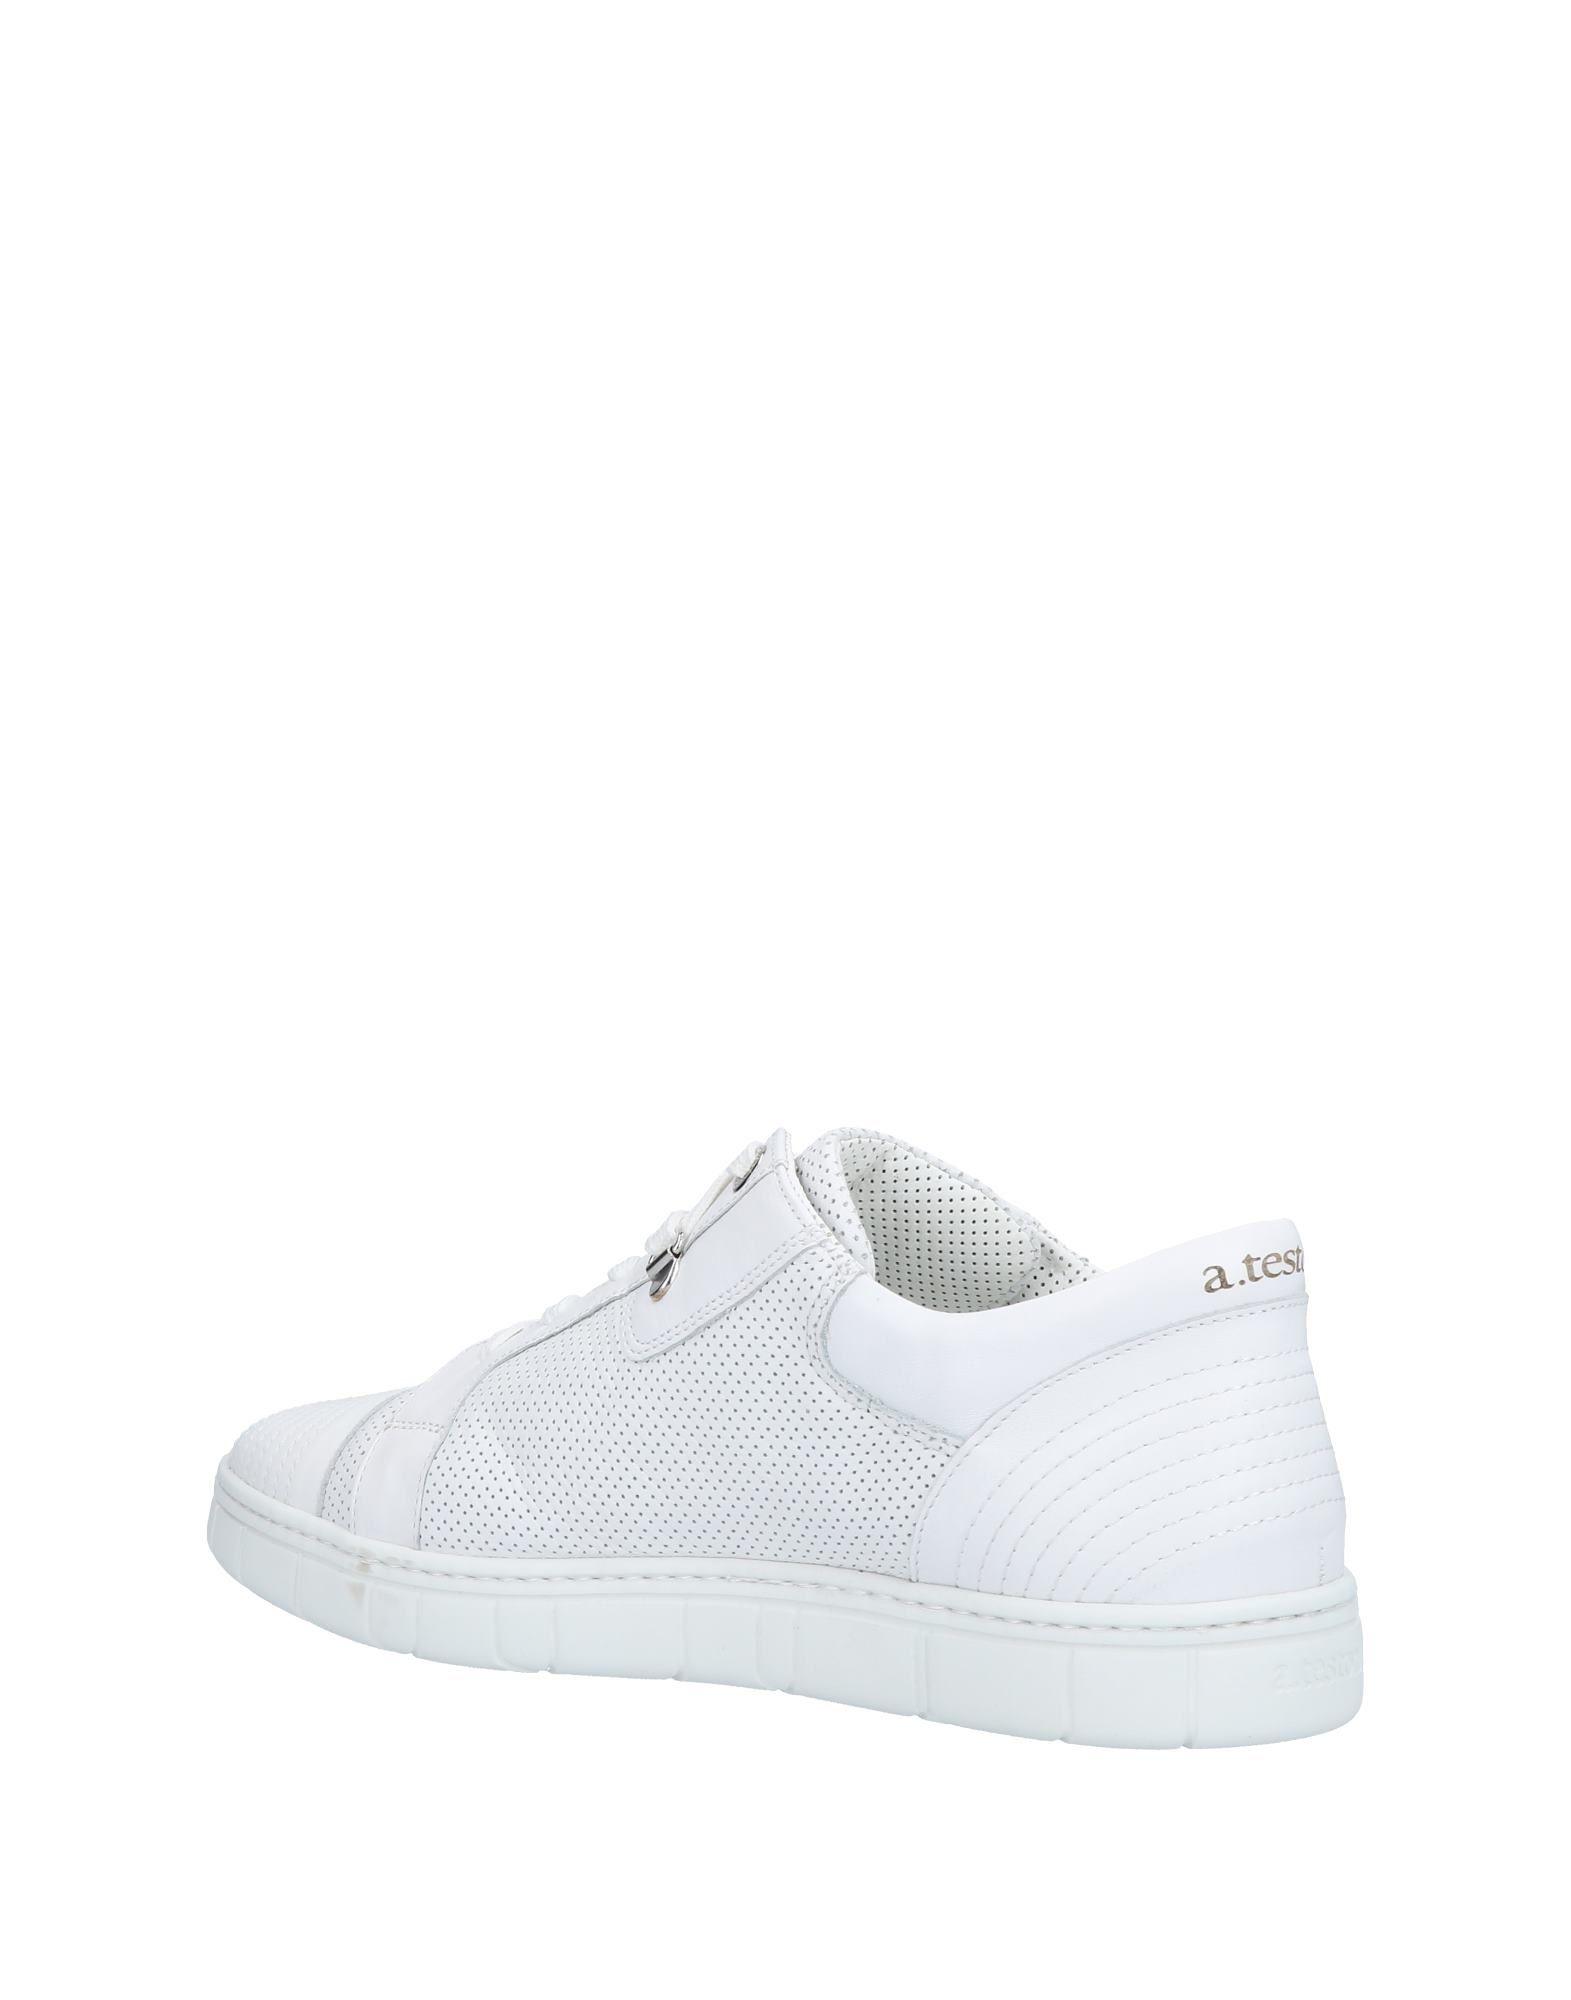 A.Testoni Sneakers Herren  11459158UC Gute Qualität beliebte Schuhe